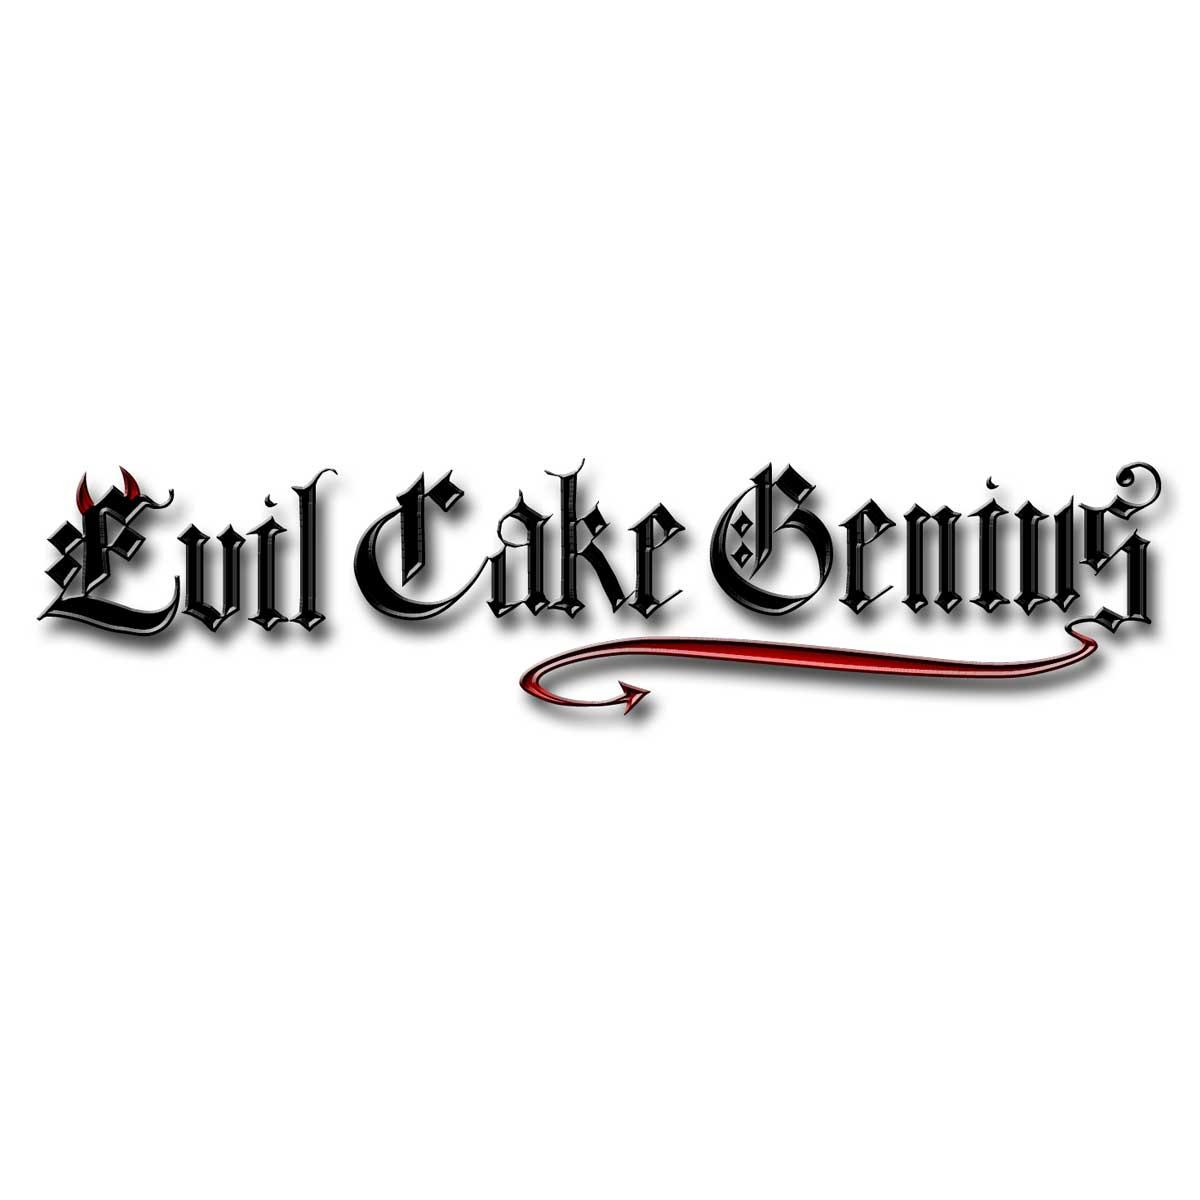 Sheet Music Mesh Stencil Small Evil Cake Genius